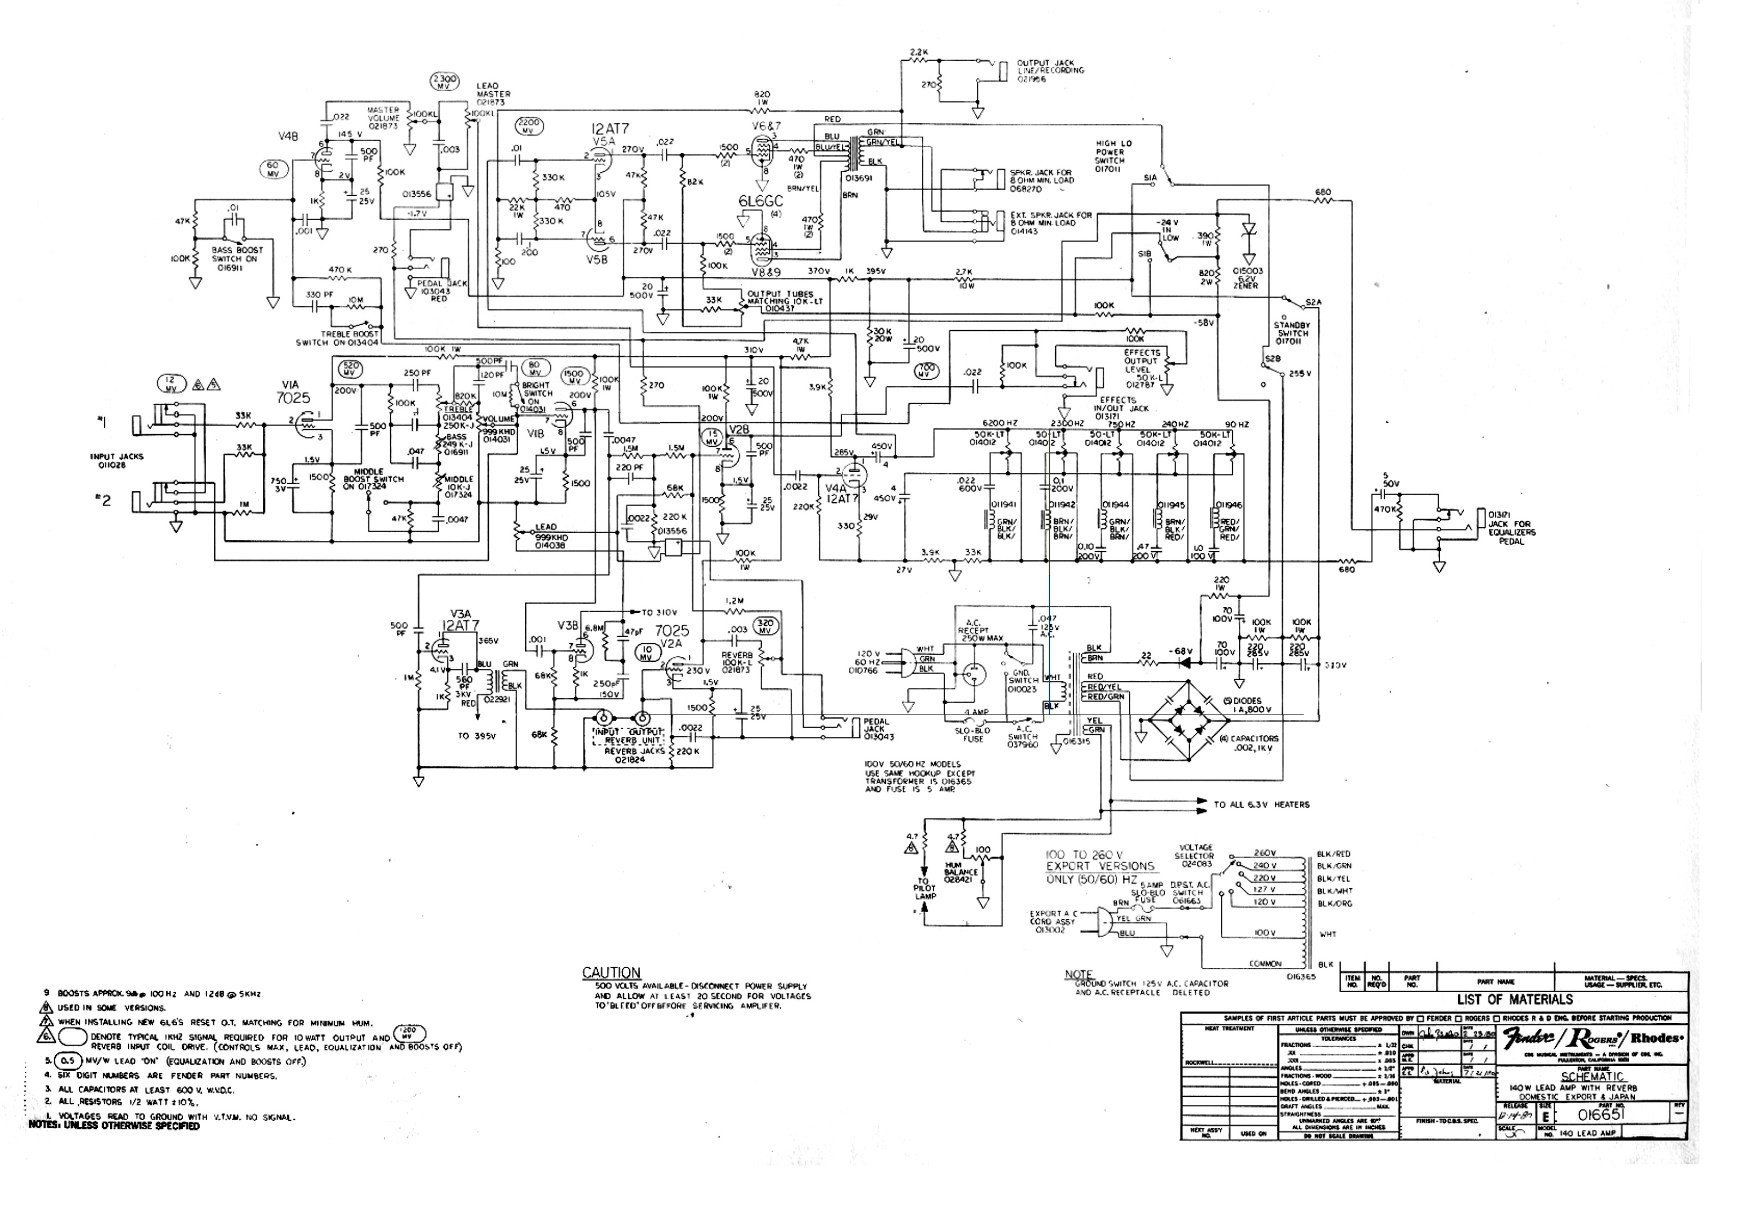 Diagram  Federal Pa300 Siren Wiring Diagram Full Version Hd Quality Wiring Diagram